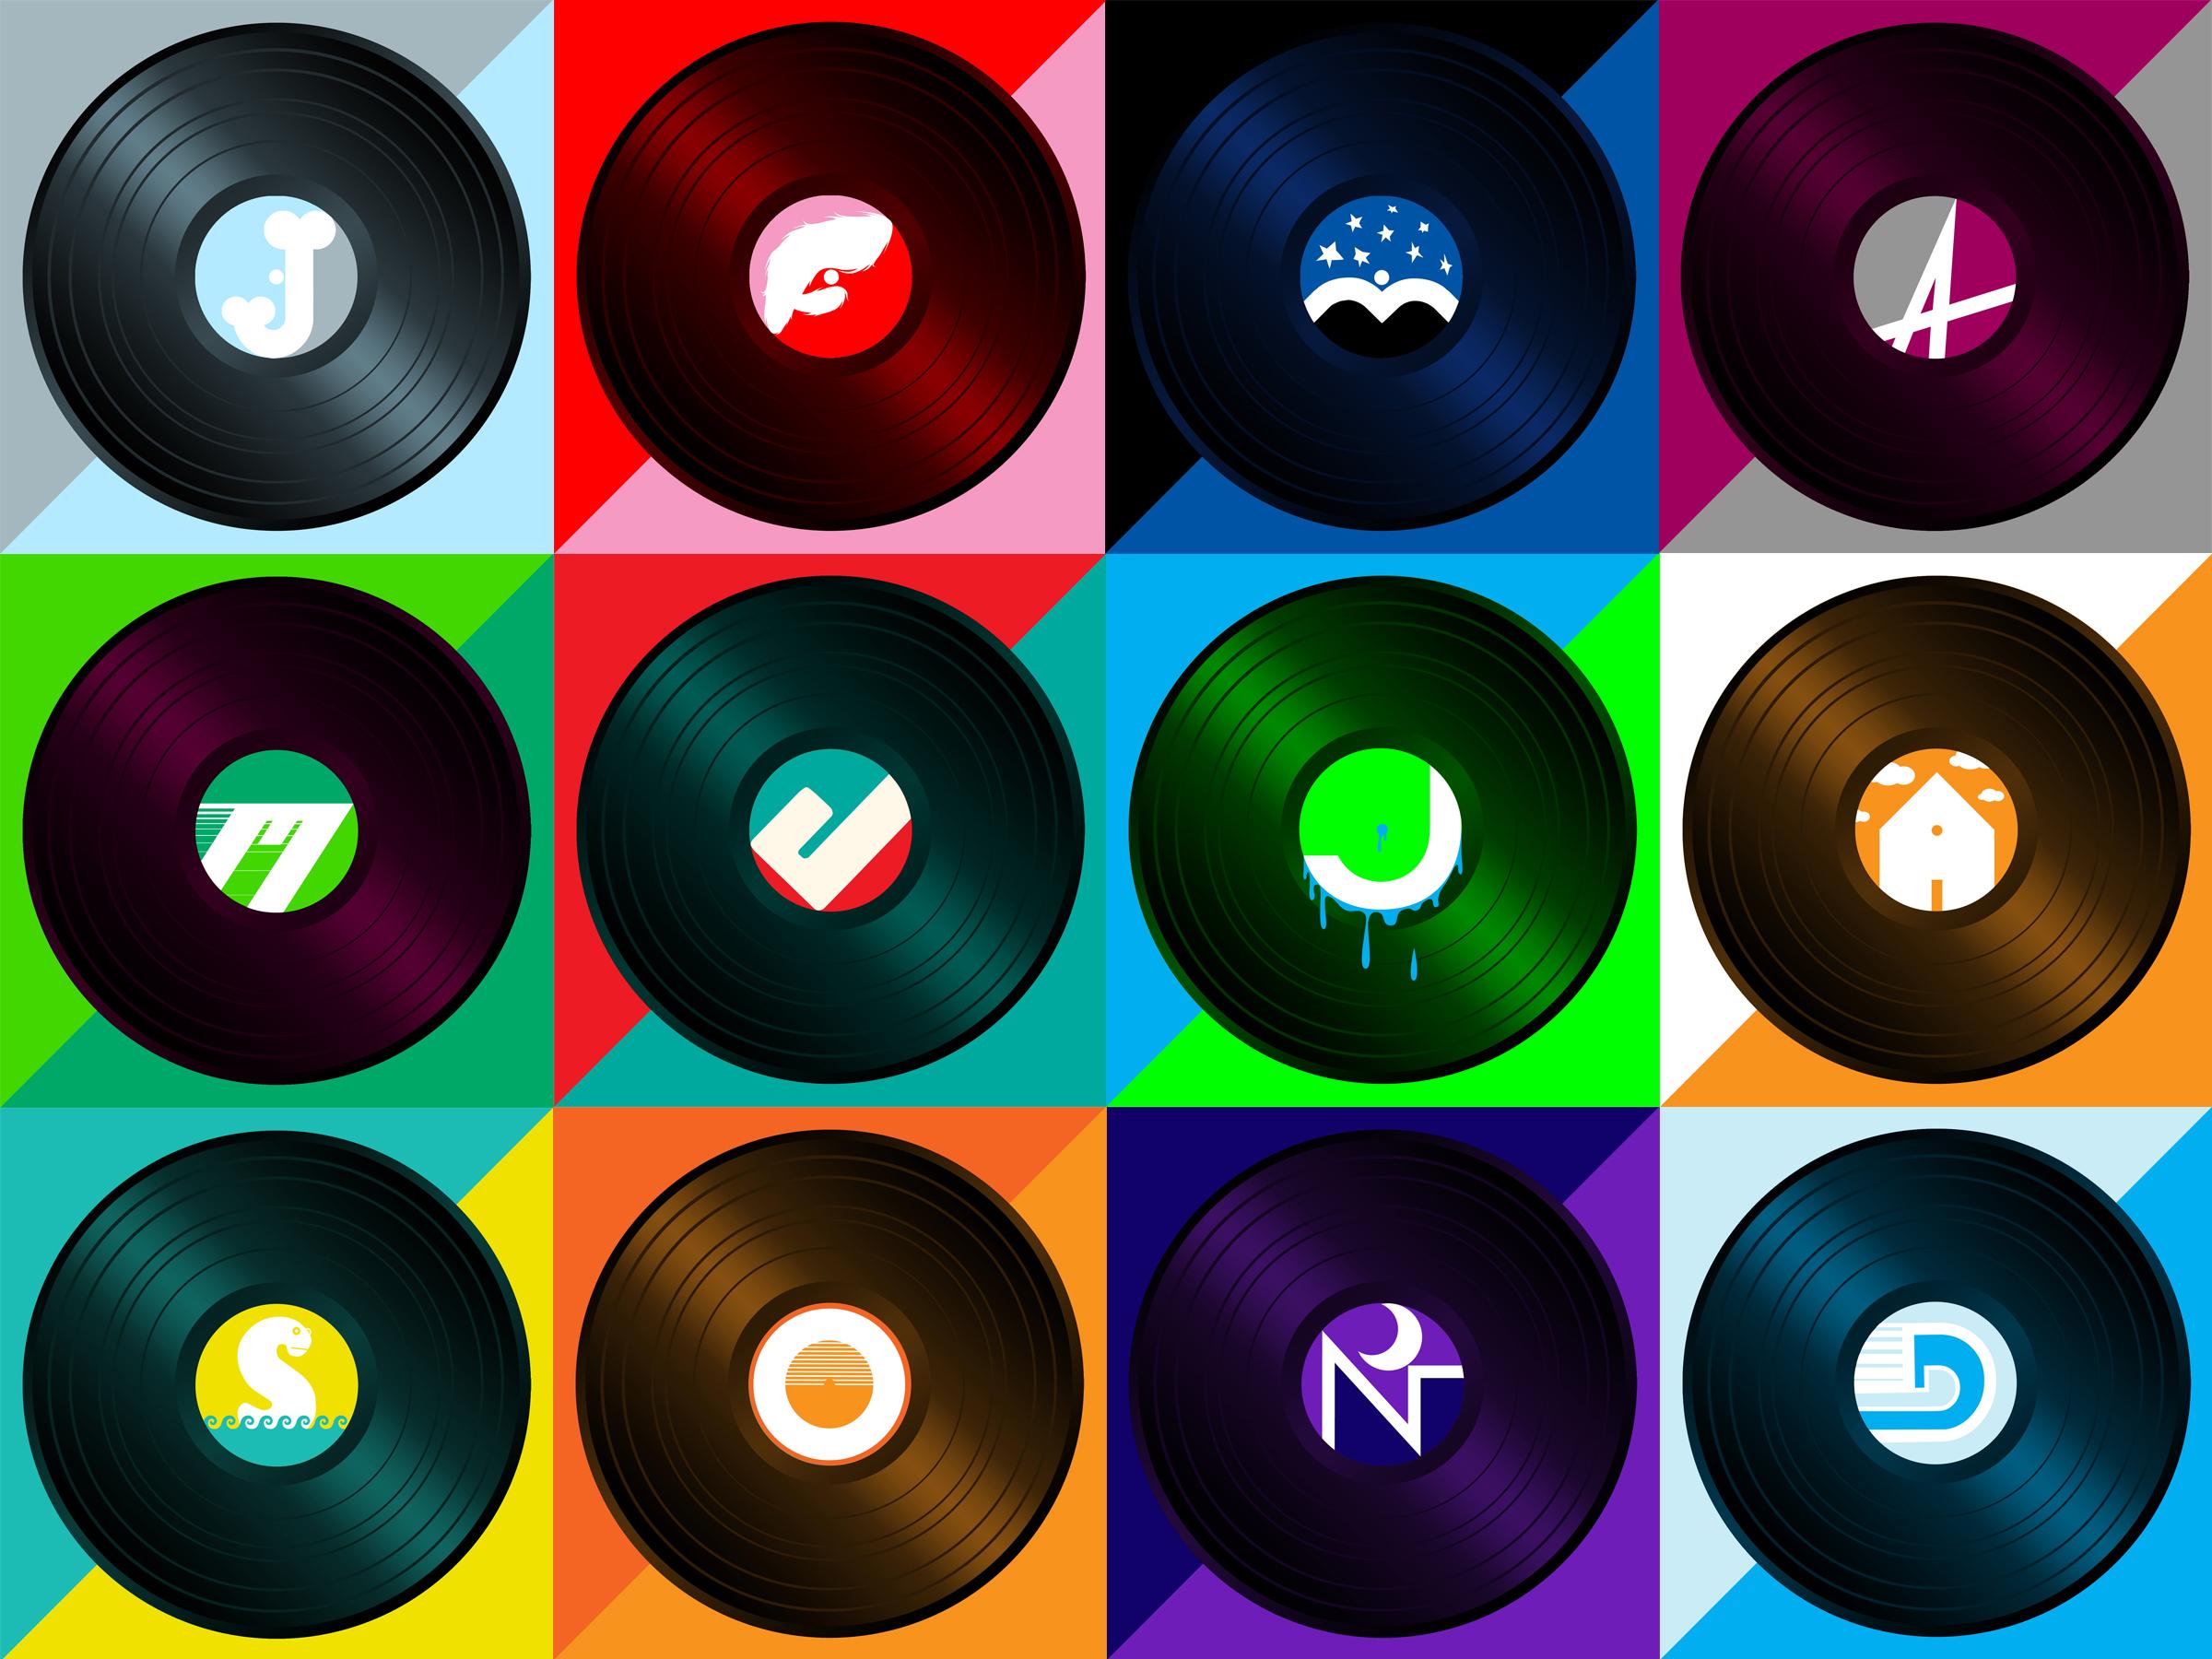 ...2014 playlist icons...